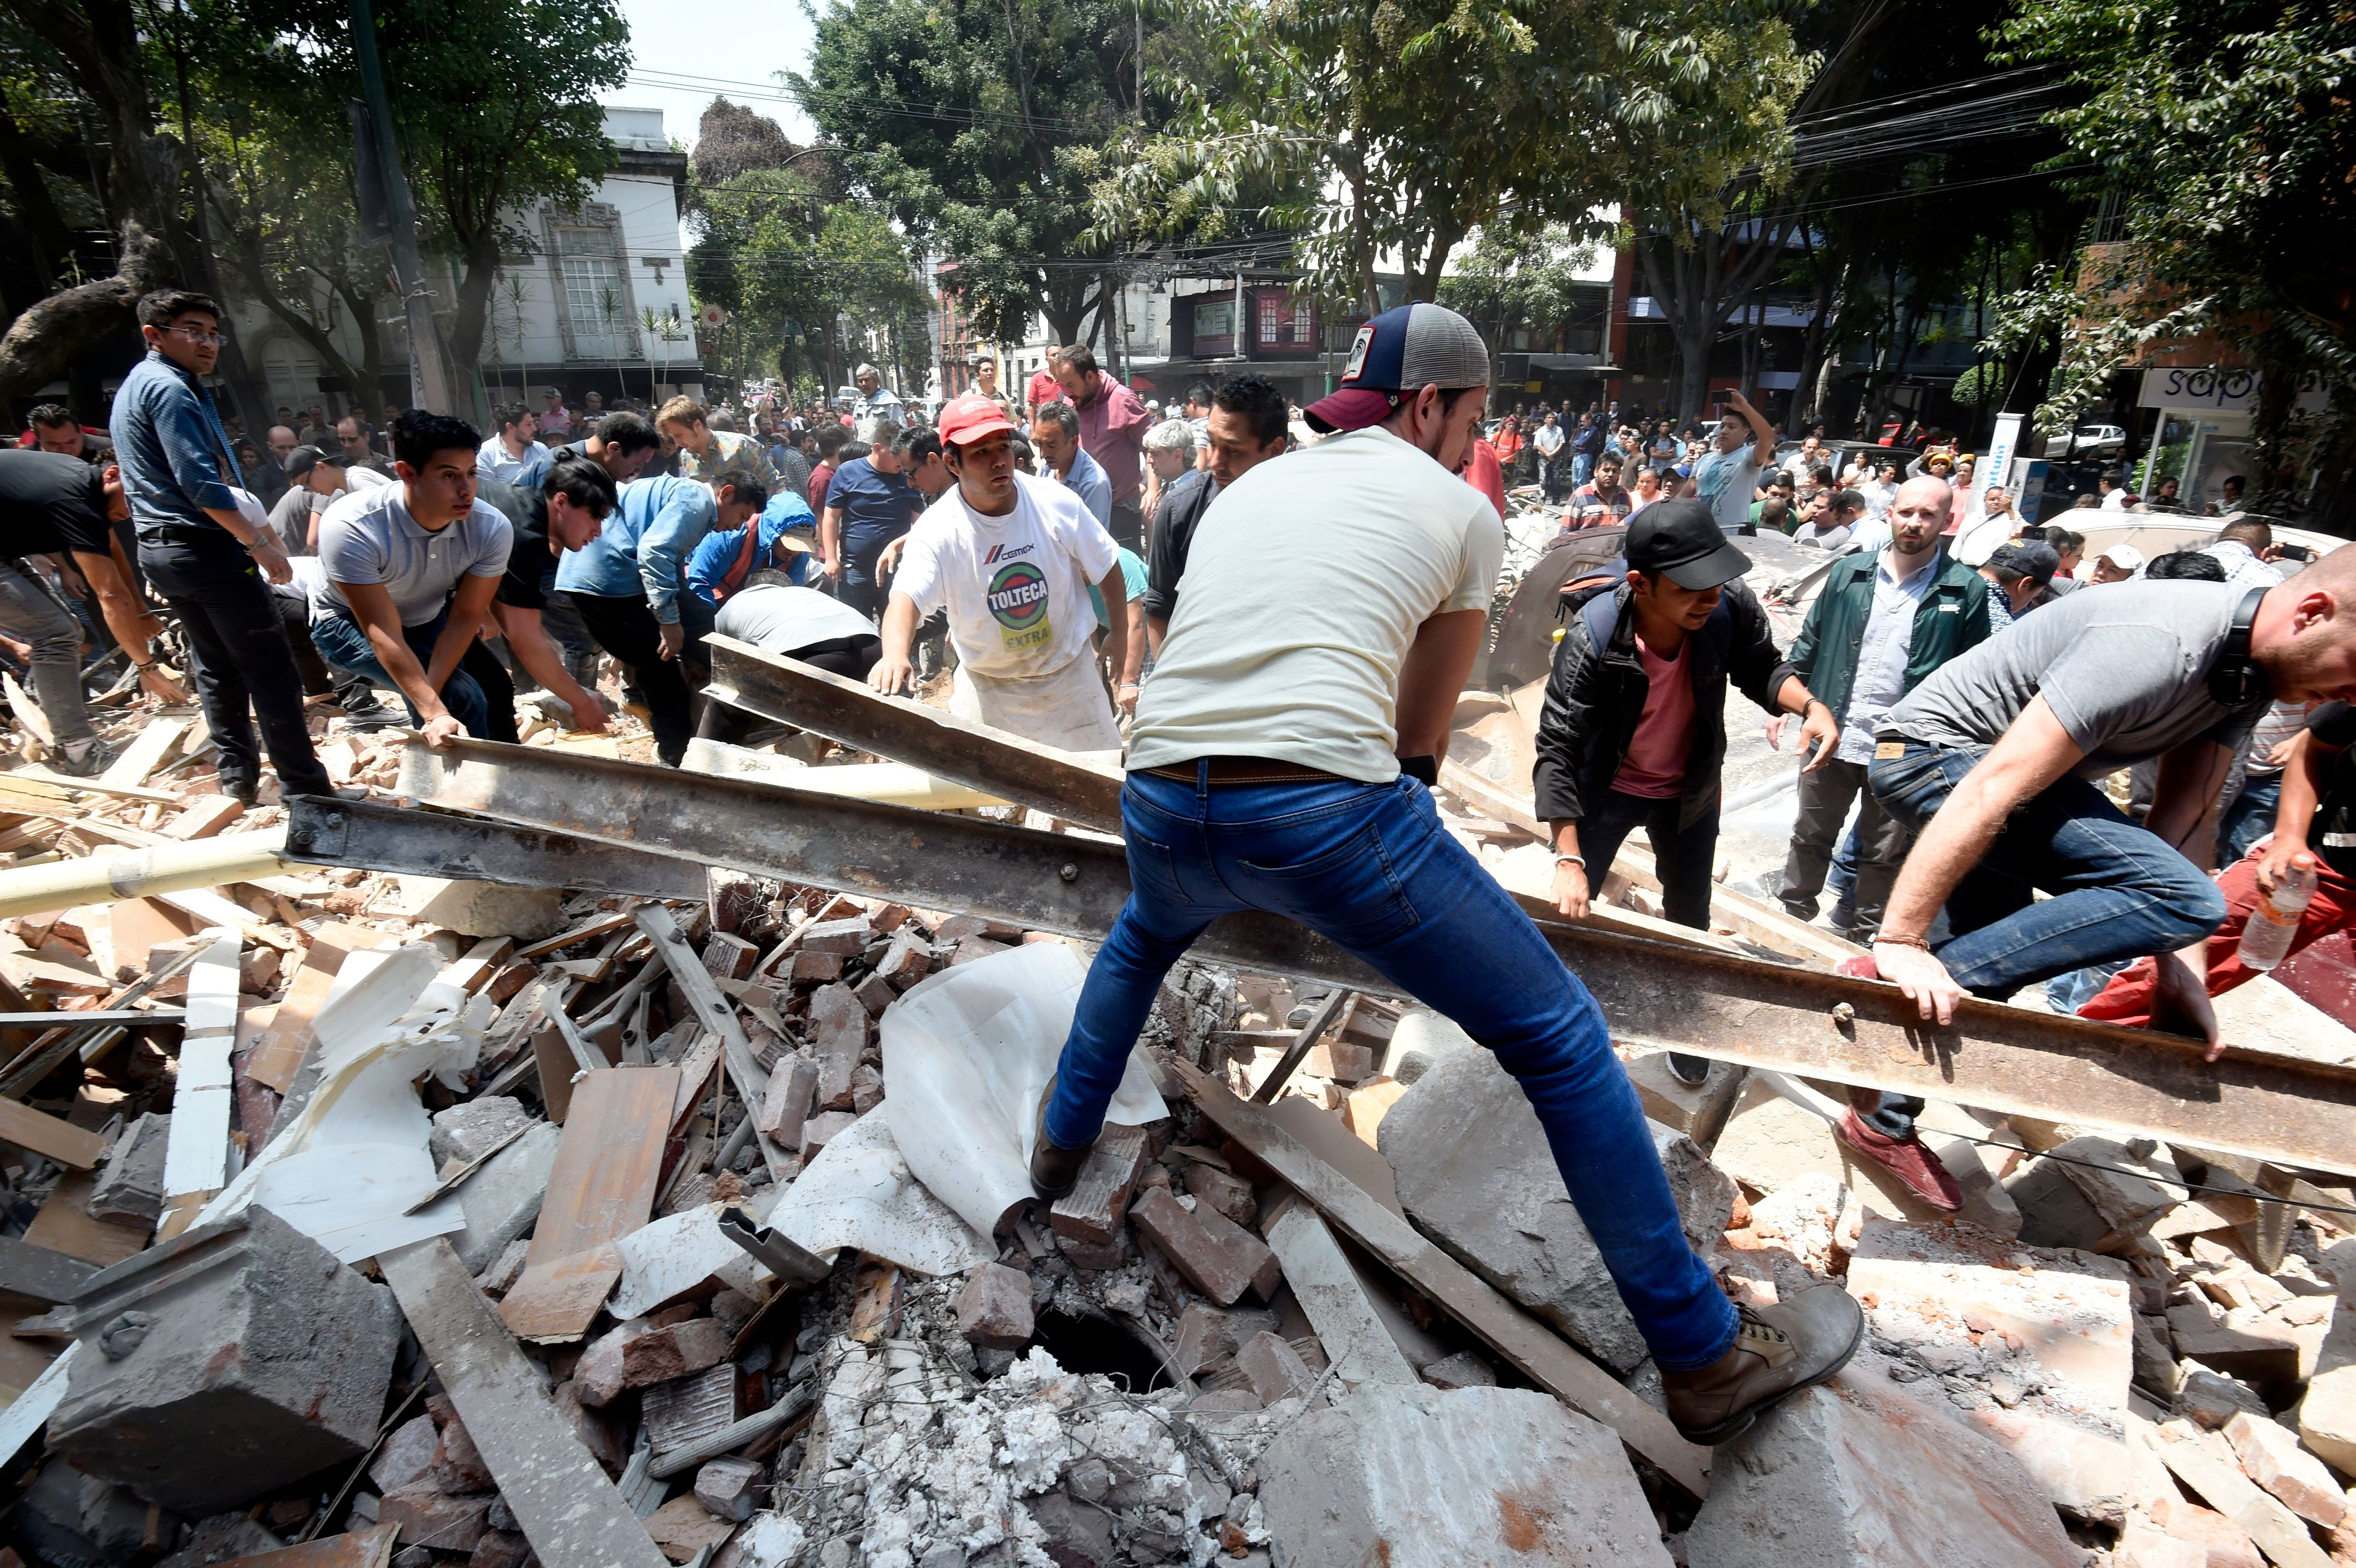 Photos Show Destruction After Powerful Earthquake Rattles